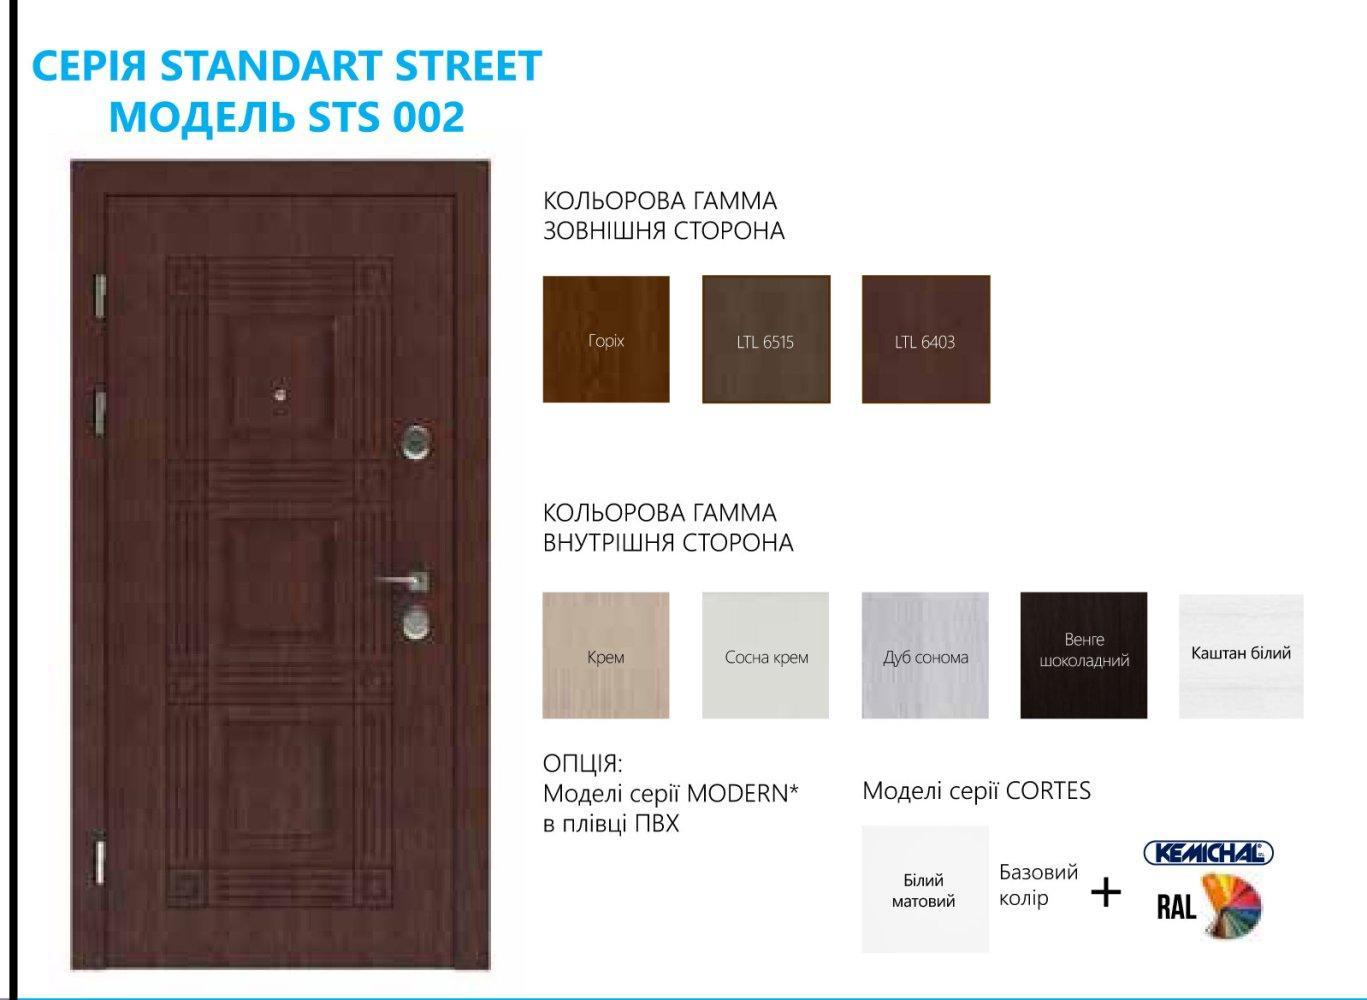 Цветовая гамма входных дверей Rodos STS Standart Street STS 002